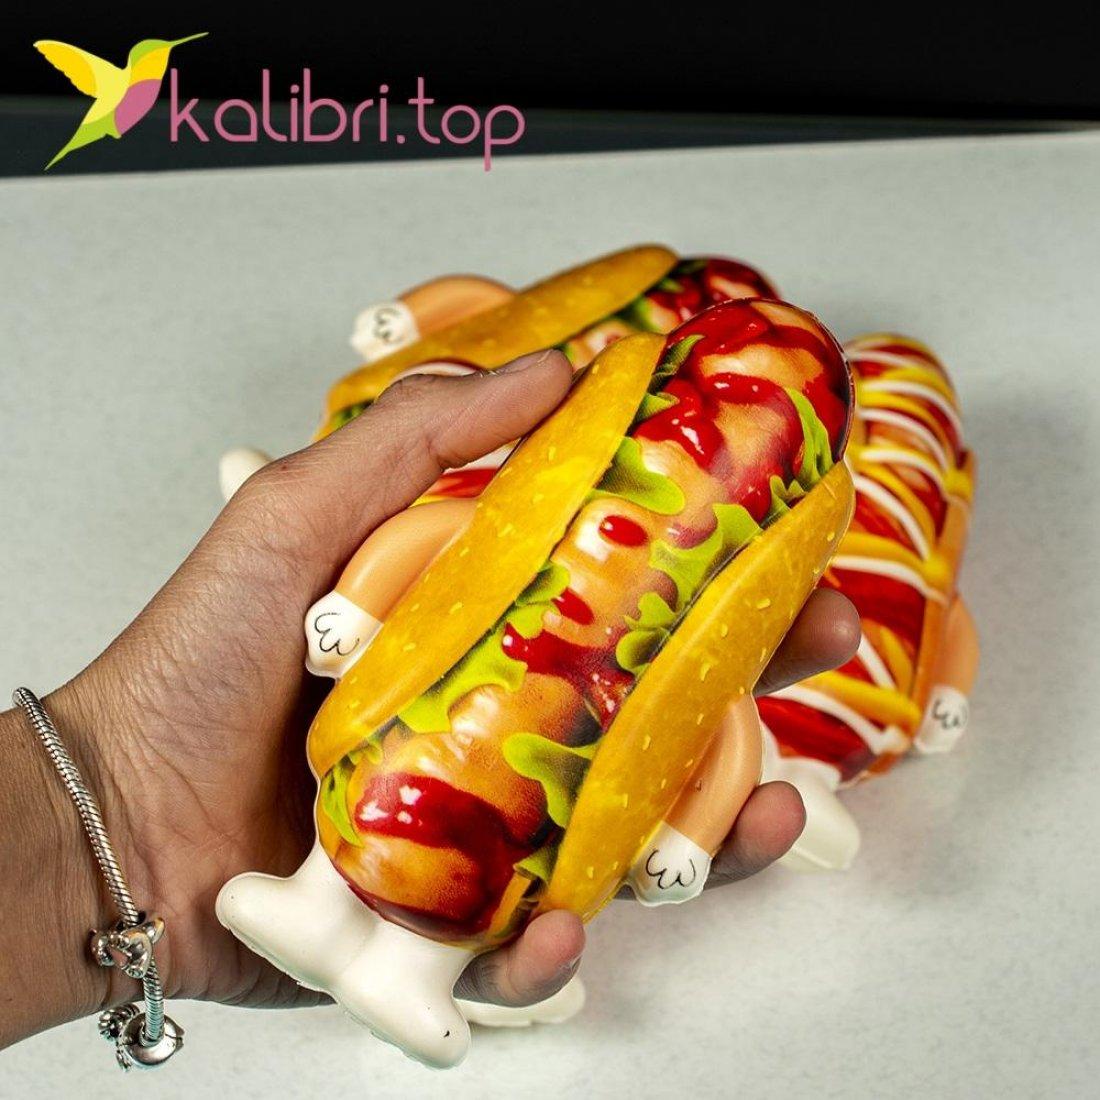 Мягкая игрушка сквиш хот-дог оптом фото 34